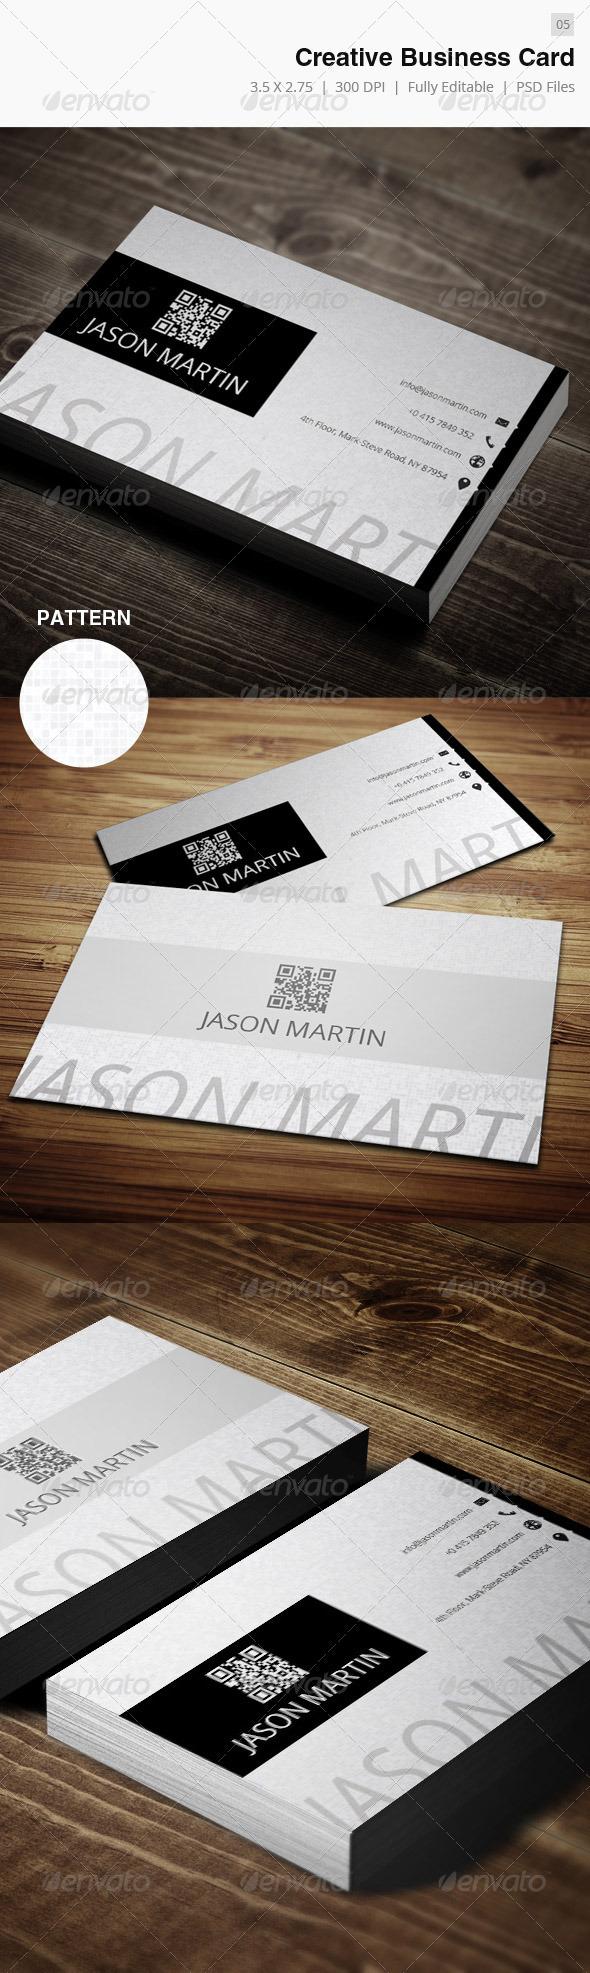 GraphicRiver Creative Business Card 05 4016265